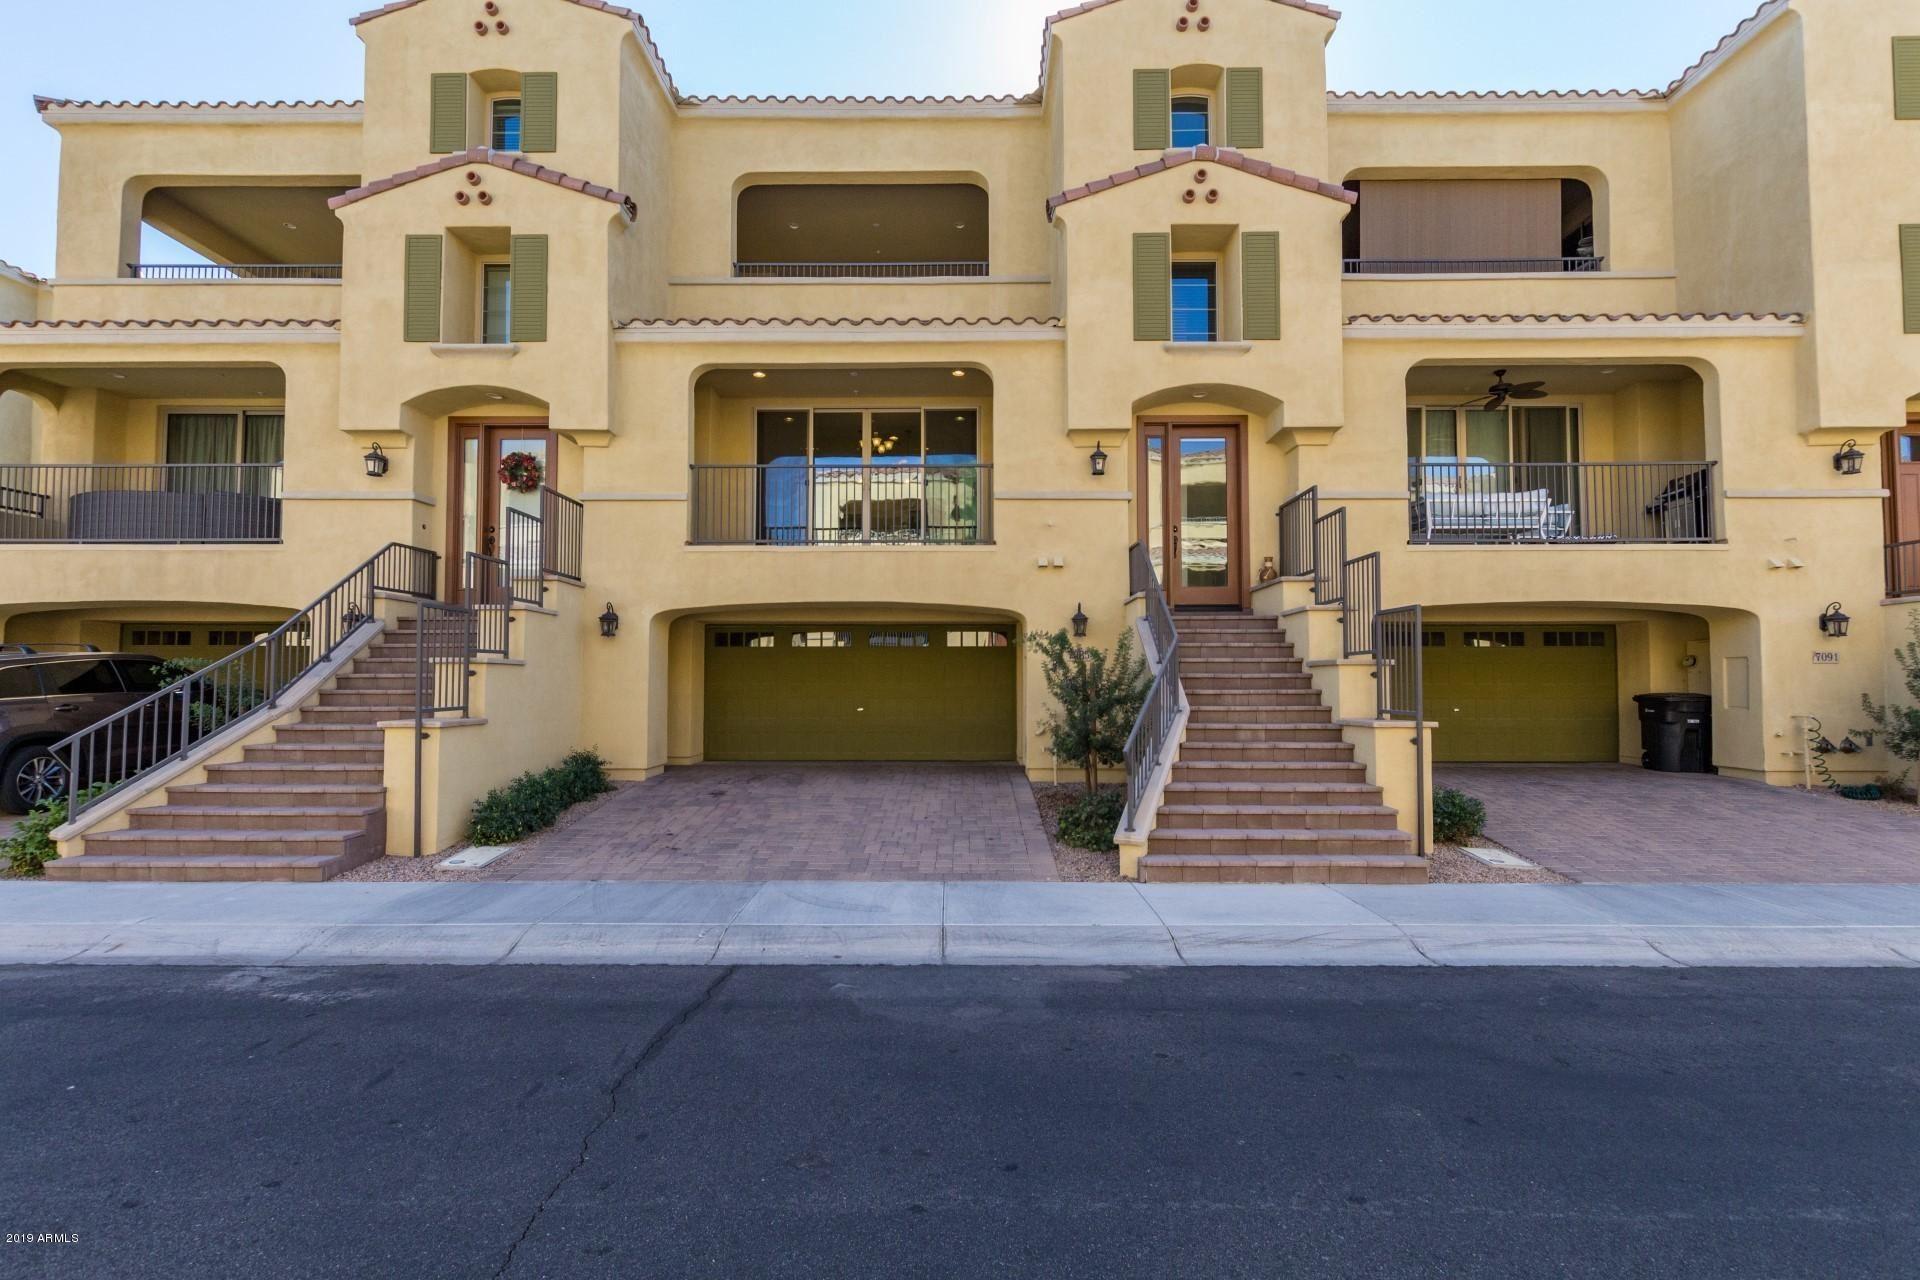 7085 W IVANHOE Street, Chandler, AZ 85226 - MLS#: 6125093